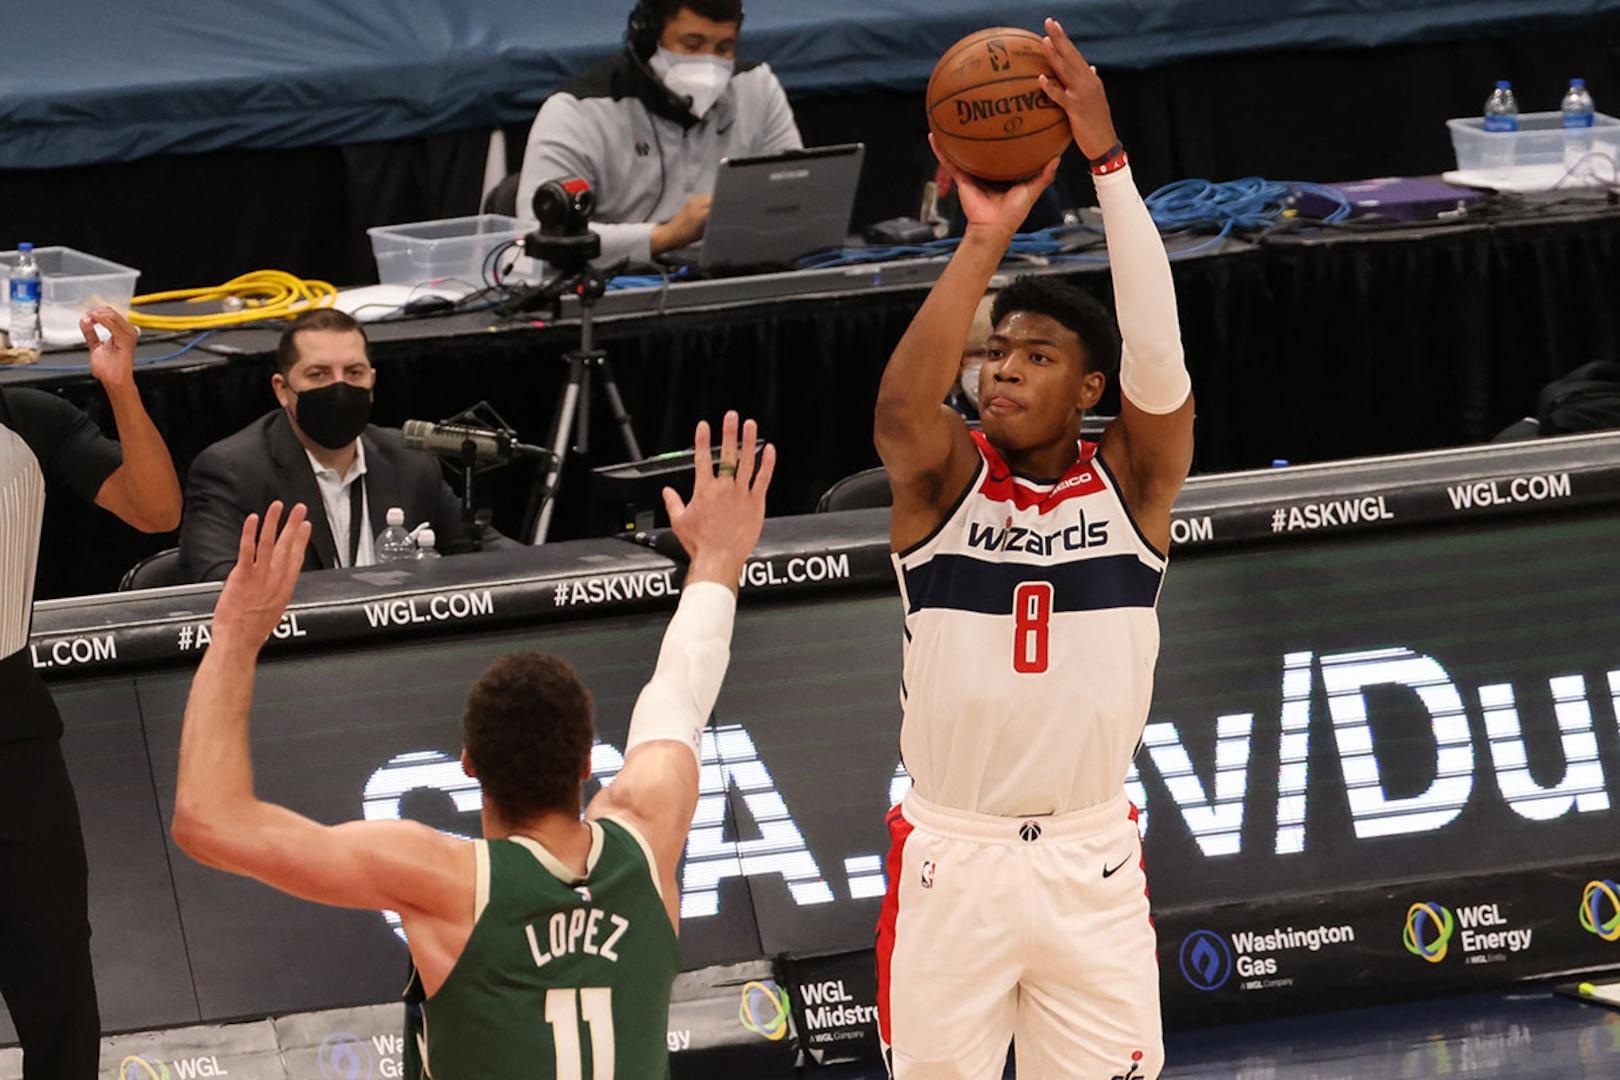 Rui Hachimura shoots the ball during an NBA game